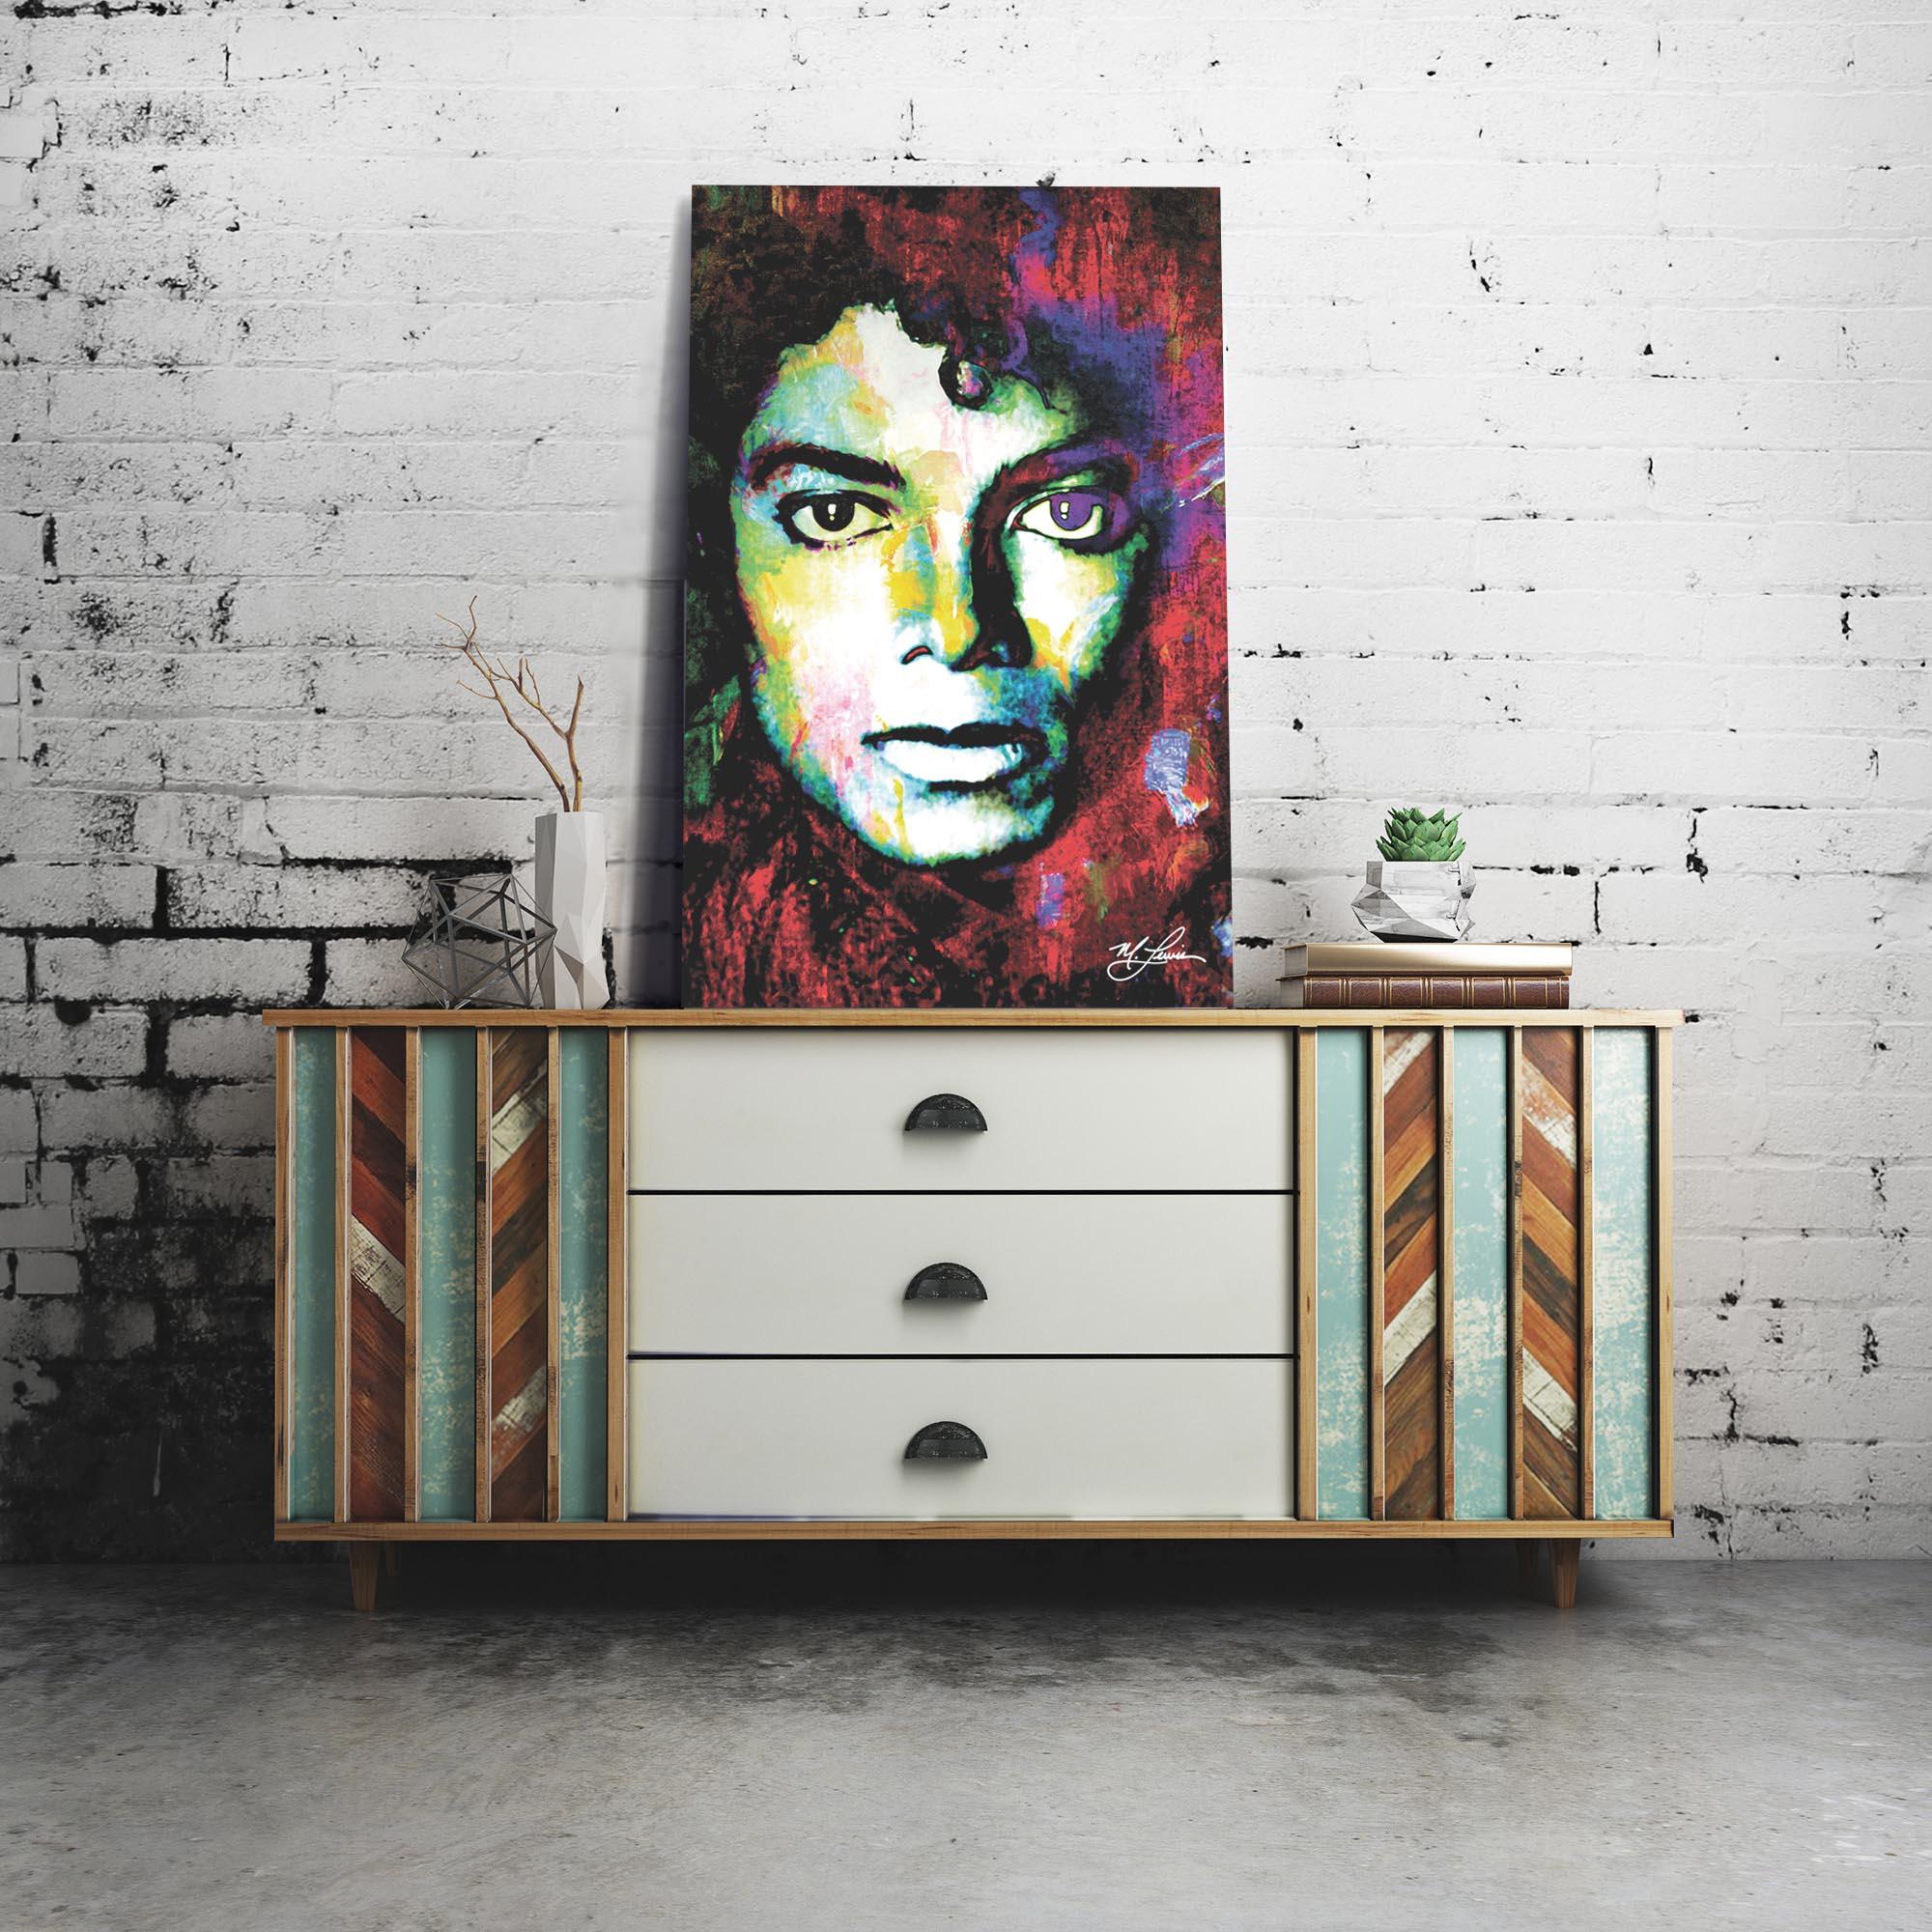 Michael Jackson Study 1 22x32 Metal or Plexiglass Pop Art Portrait - Lifestyle View